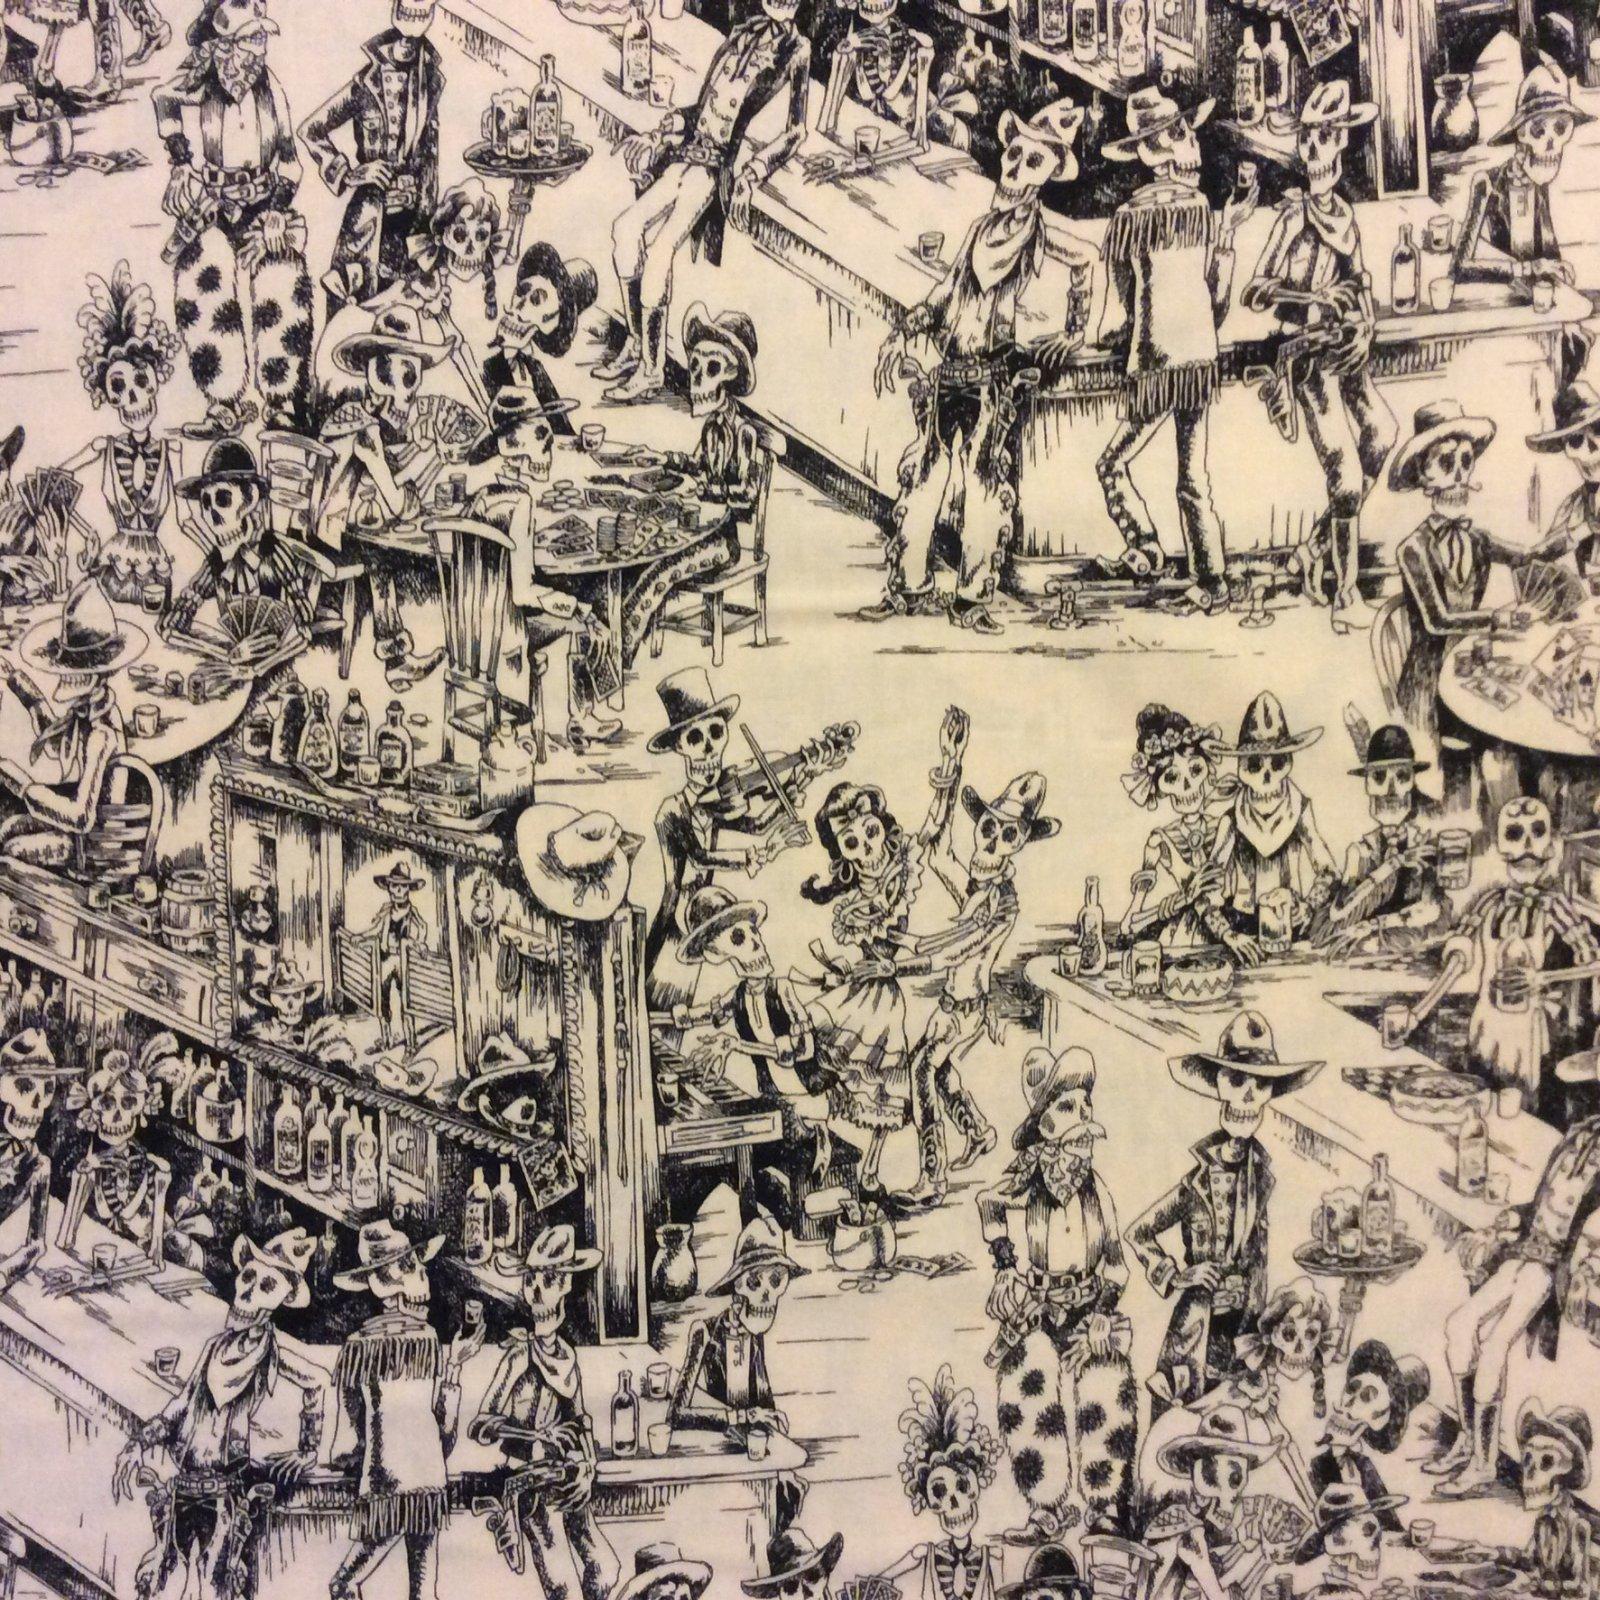 Dia de los Muertos Spooky Saloon Skeleton Toile Day of the Dead Skele-Toile Cotton Quilt Fabric  AH182